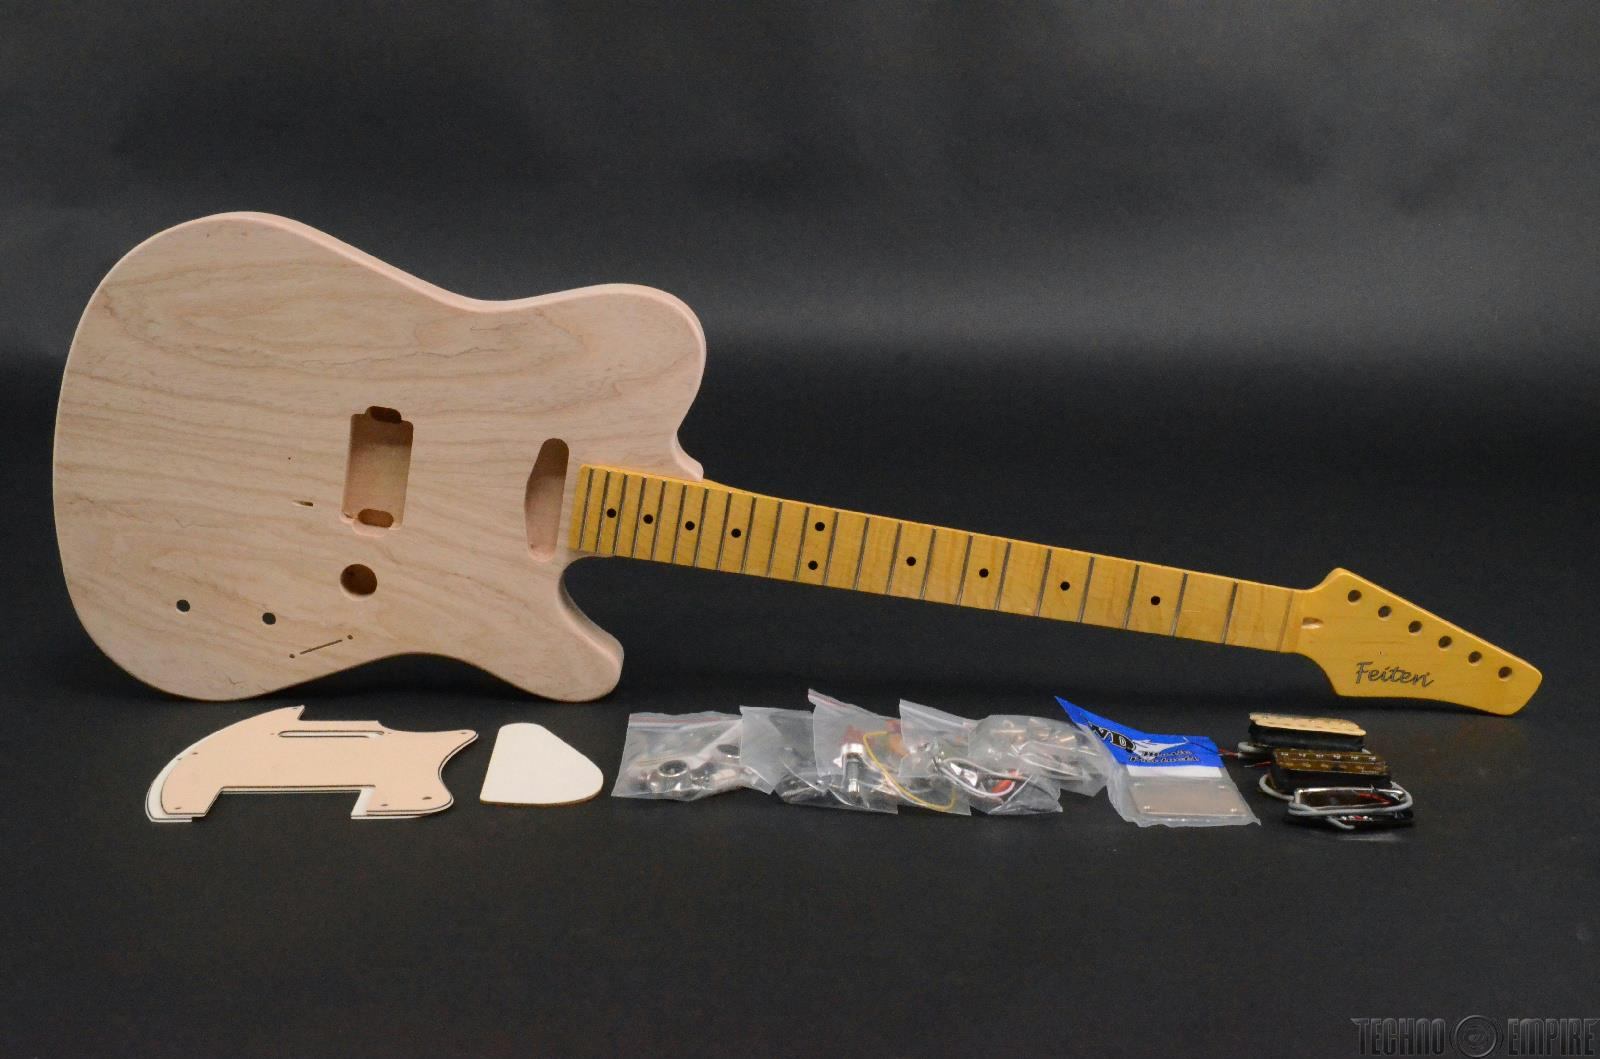 buzz feiten elite pro build your own electric guitar kit 28459 techno empire. Black Bedroom Furniture Sets. Home Design Ideas